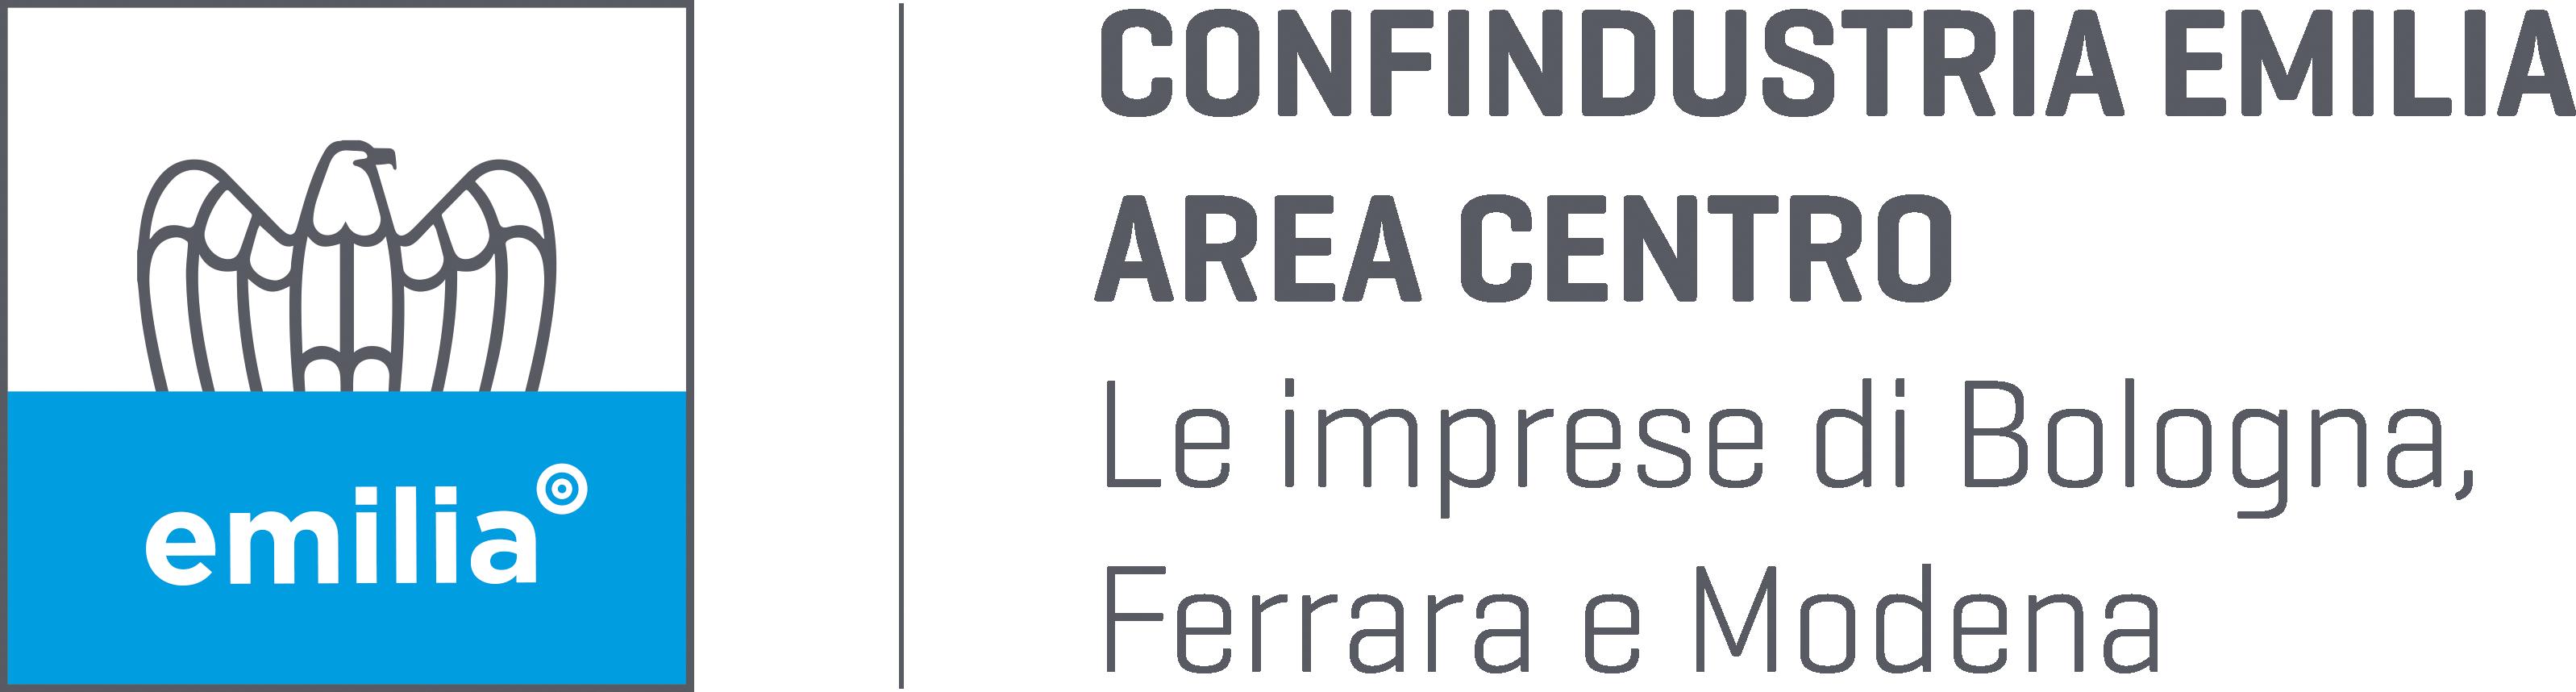 CONF Confindustria Emilia 2021